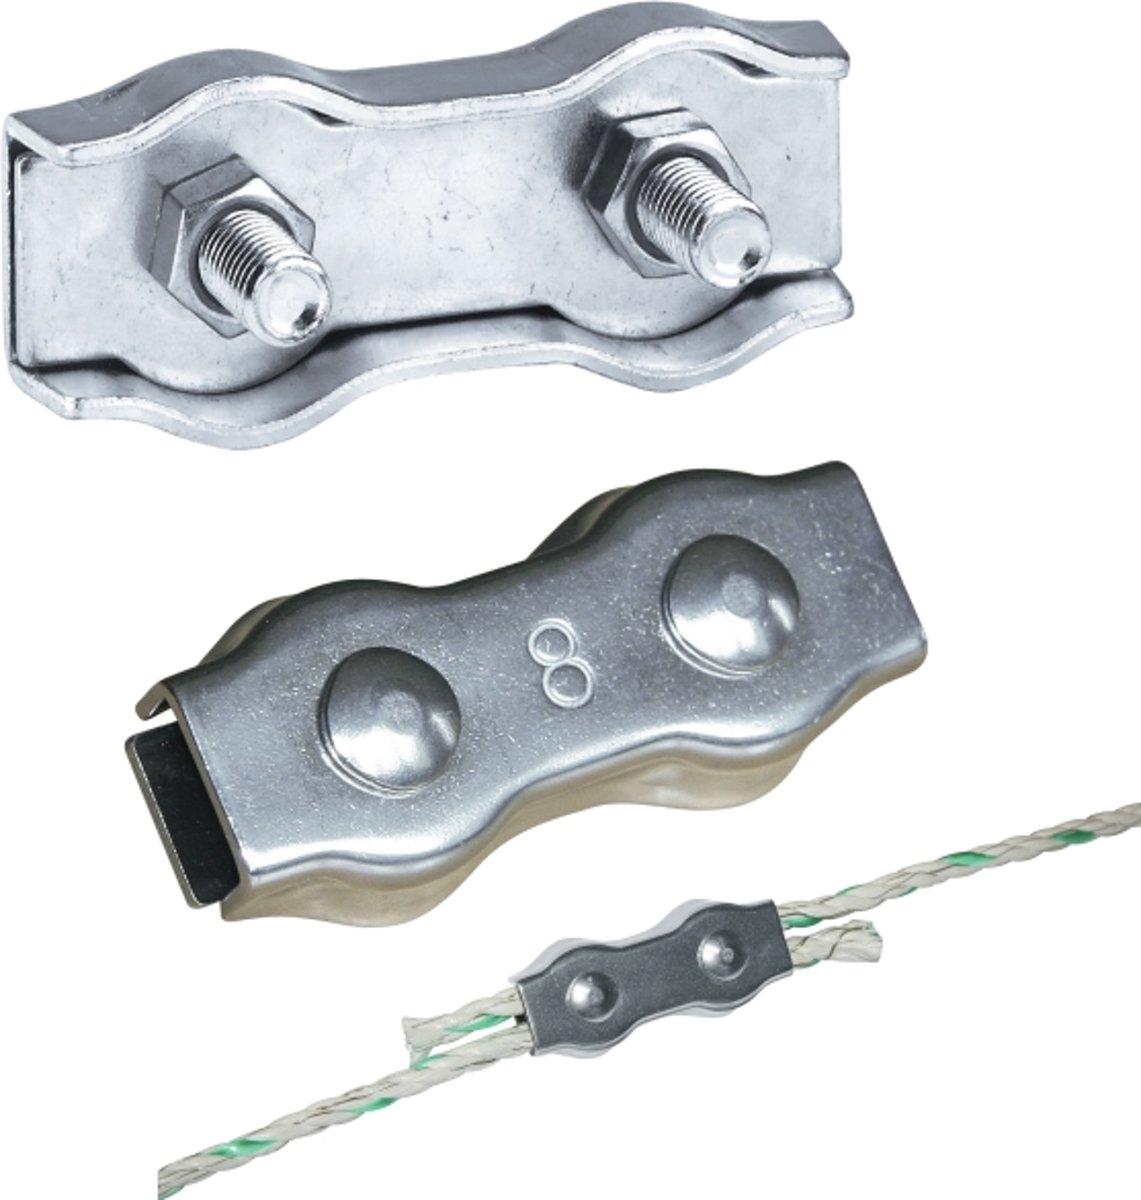 AKO Koordverbinder RVS 8mm (10 stuks)